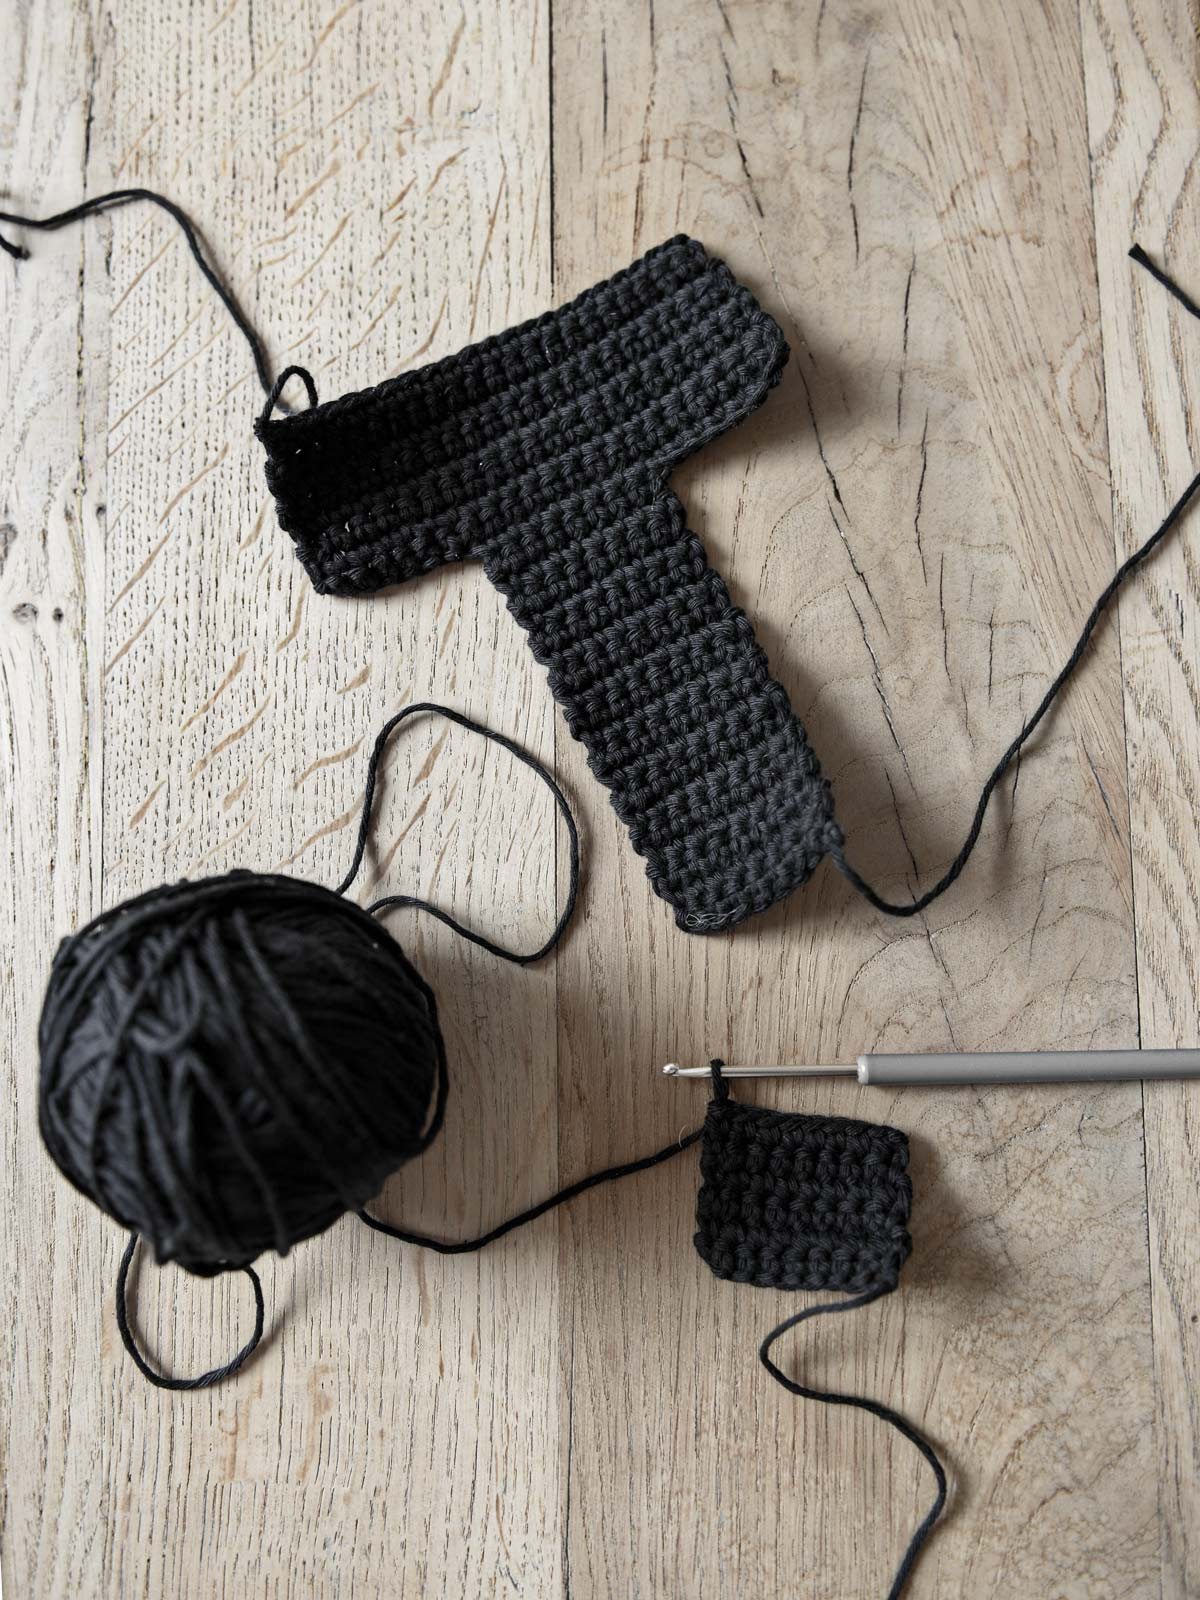 DIY | Buchstaben häkeln - mxliving